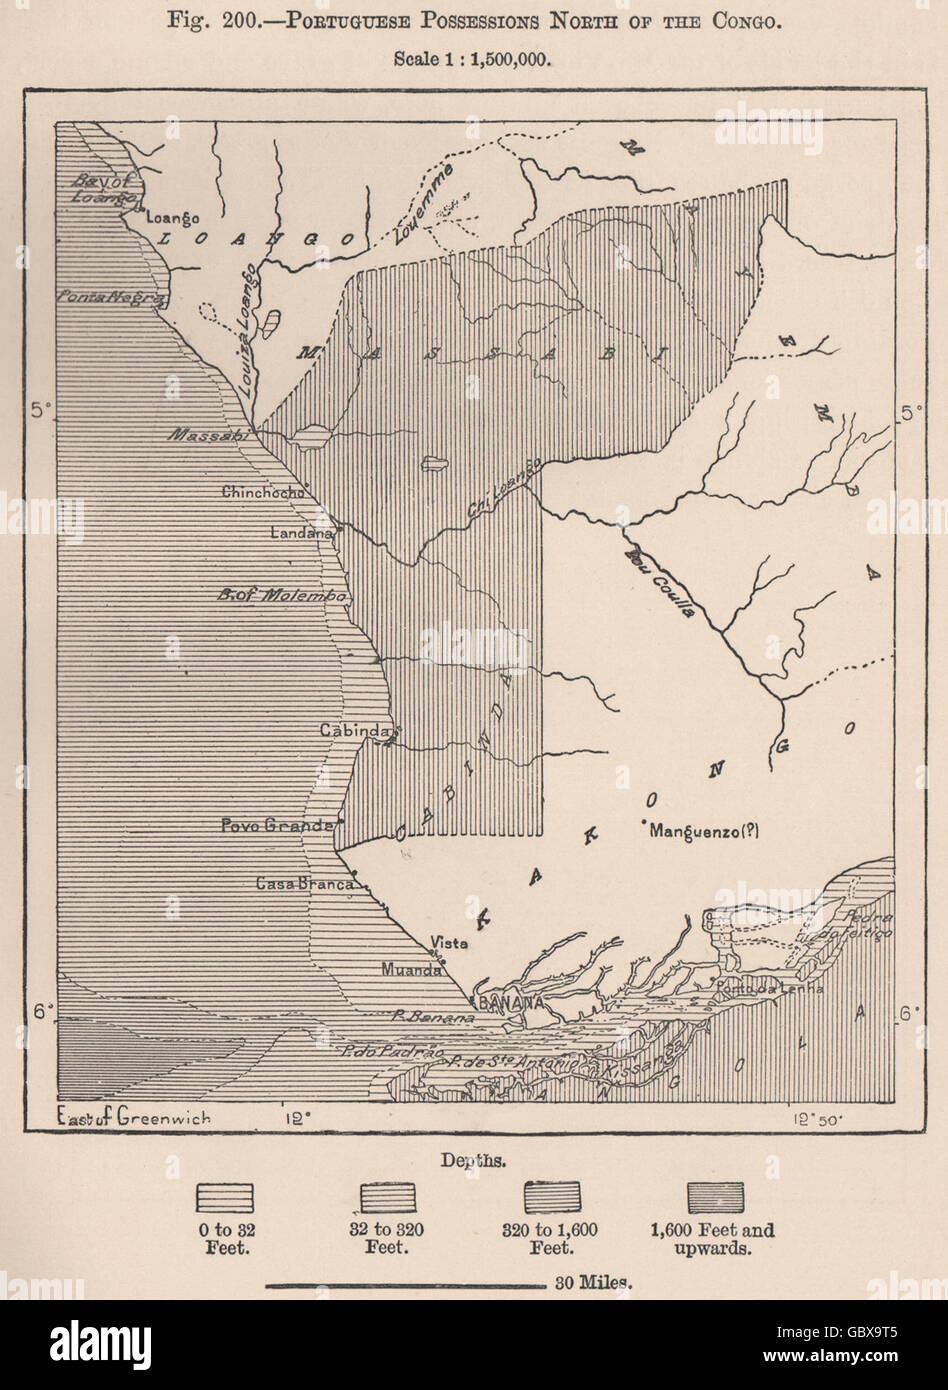 Tchiowa Province, Angola. Portuguese possessions North of the Congo, 1885 map - Stock Image